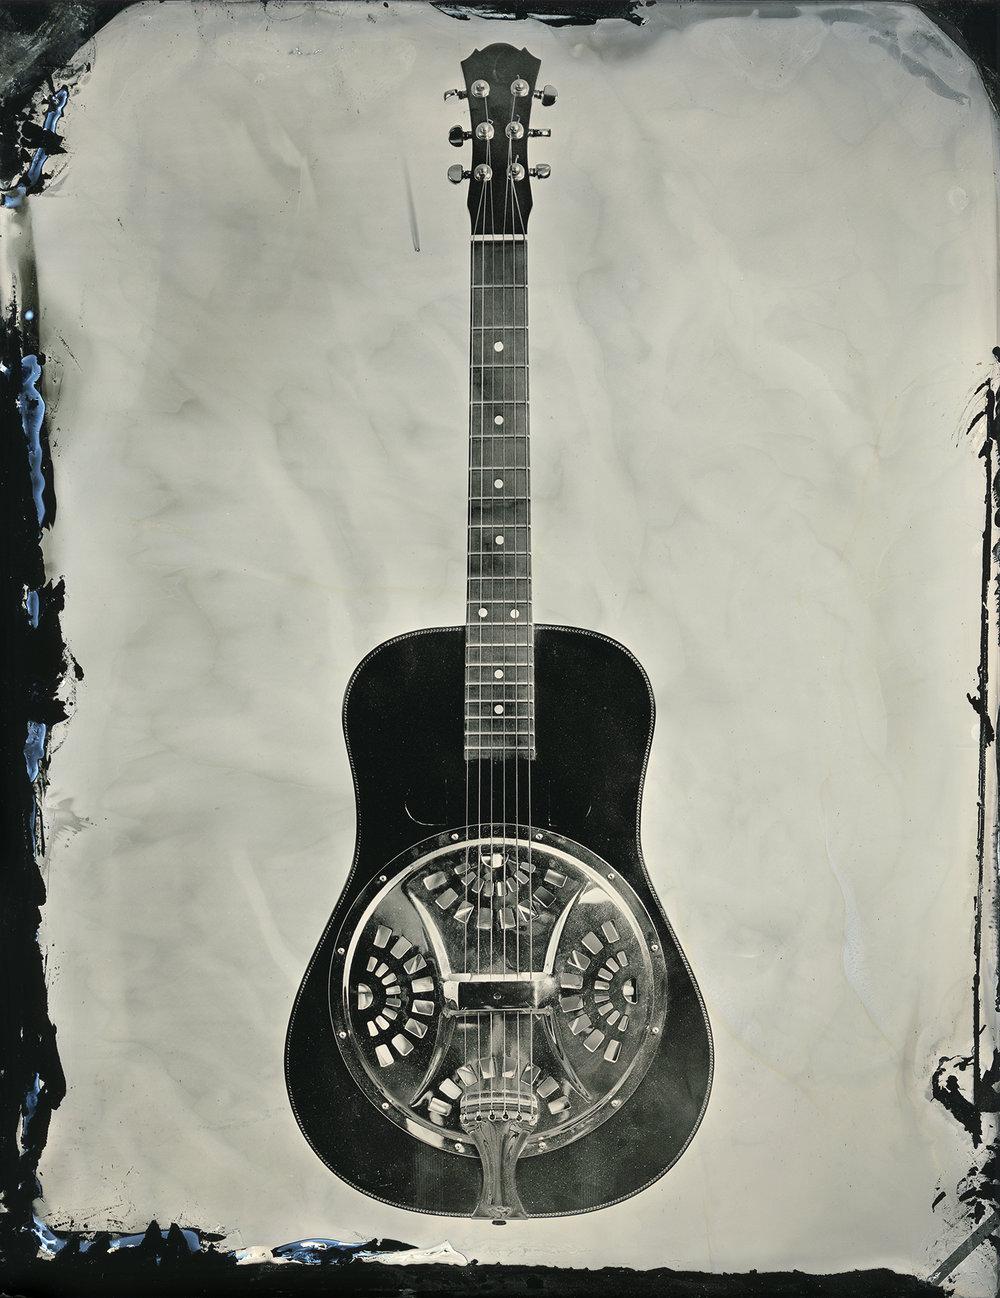 guitar_steel_16x20_sec.jpg